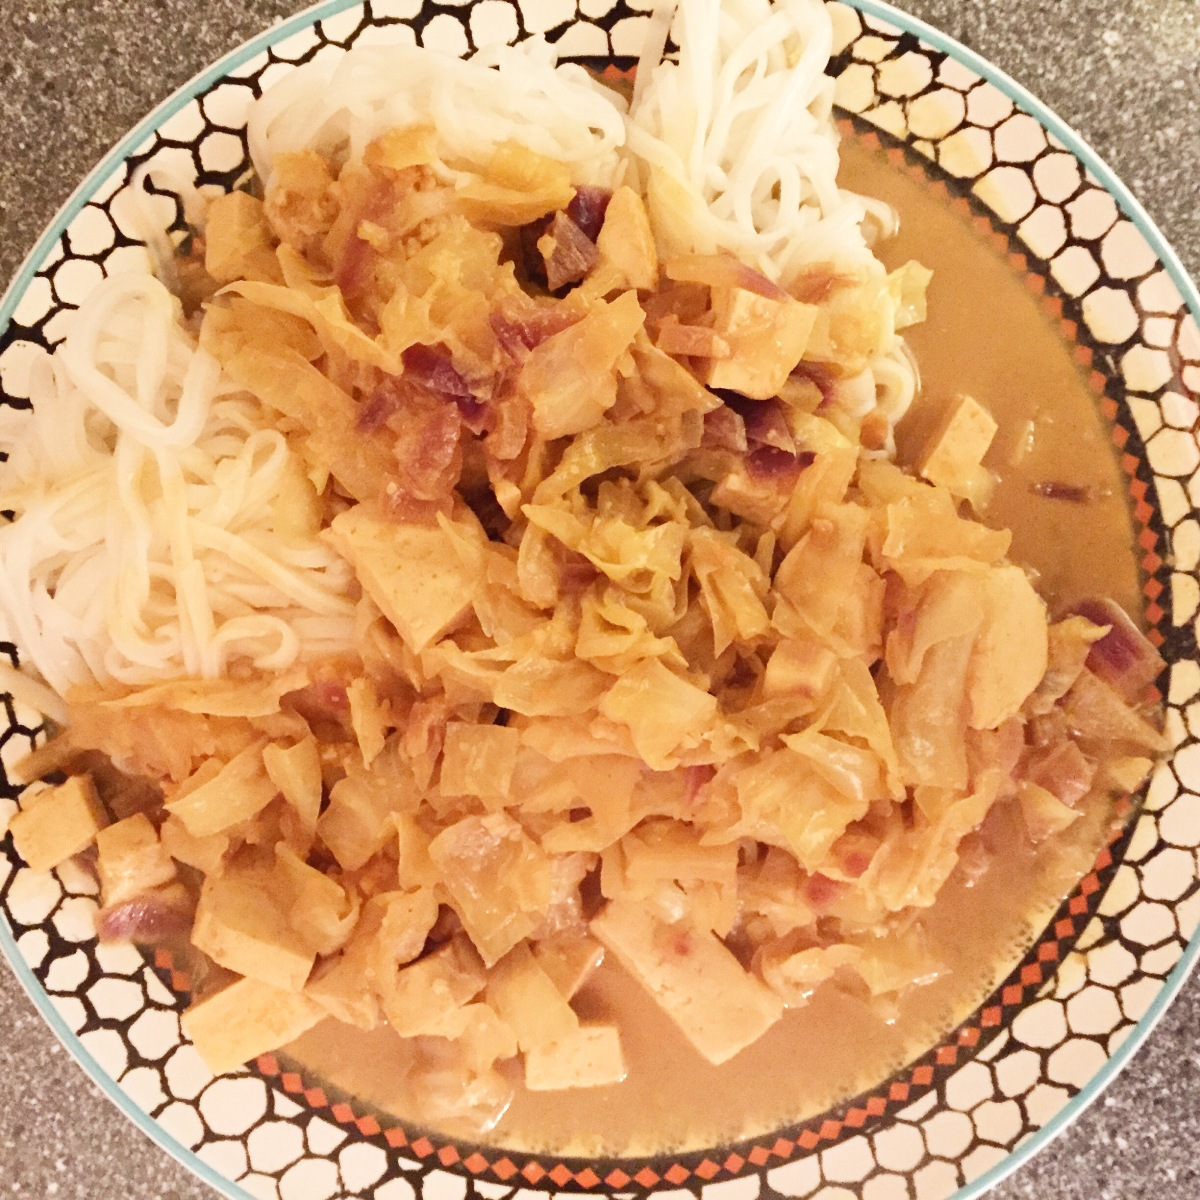 Spitzkohl mit Tofu in Erdnuss-Sauce